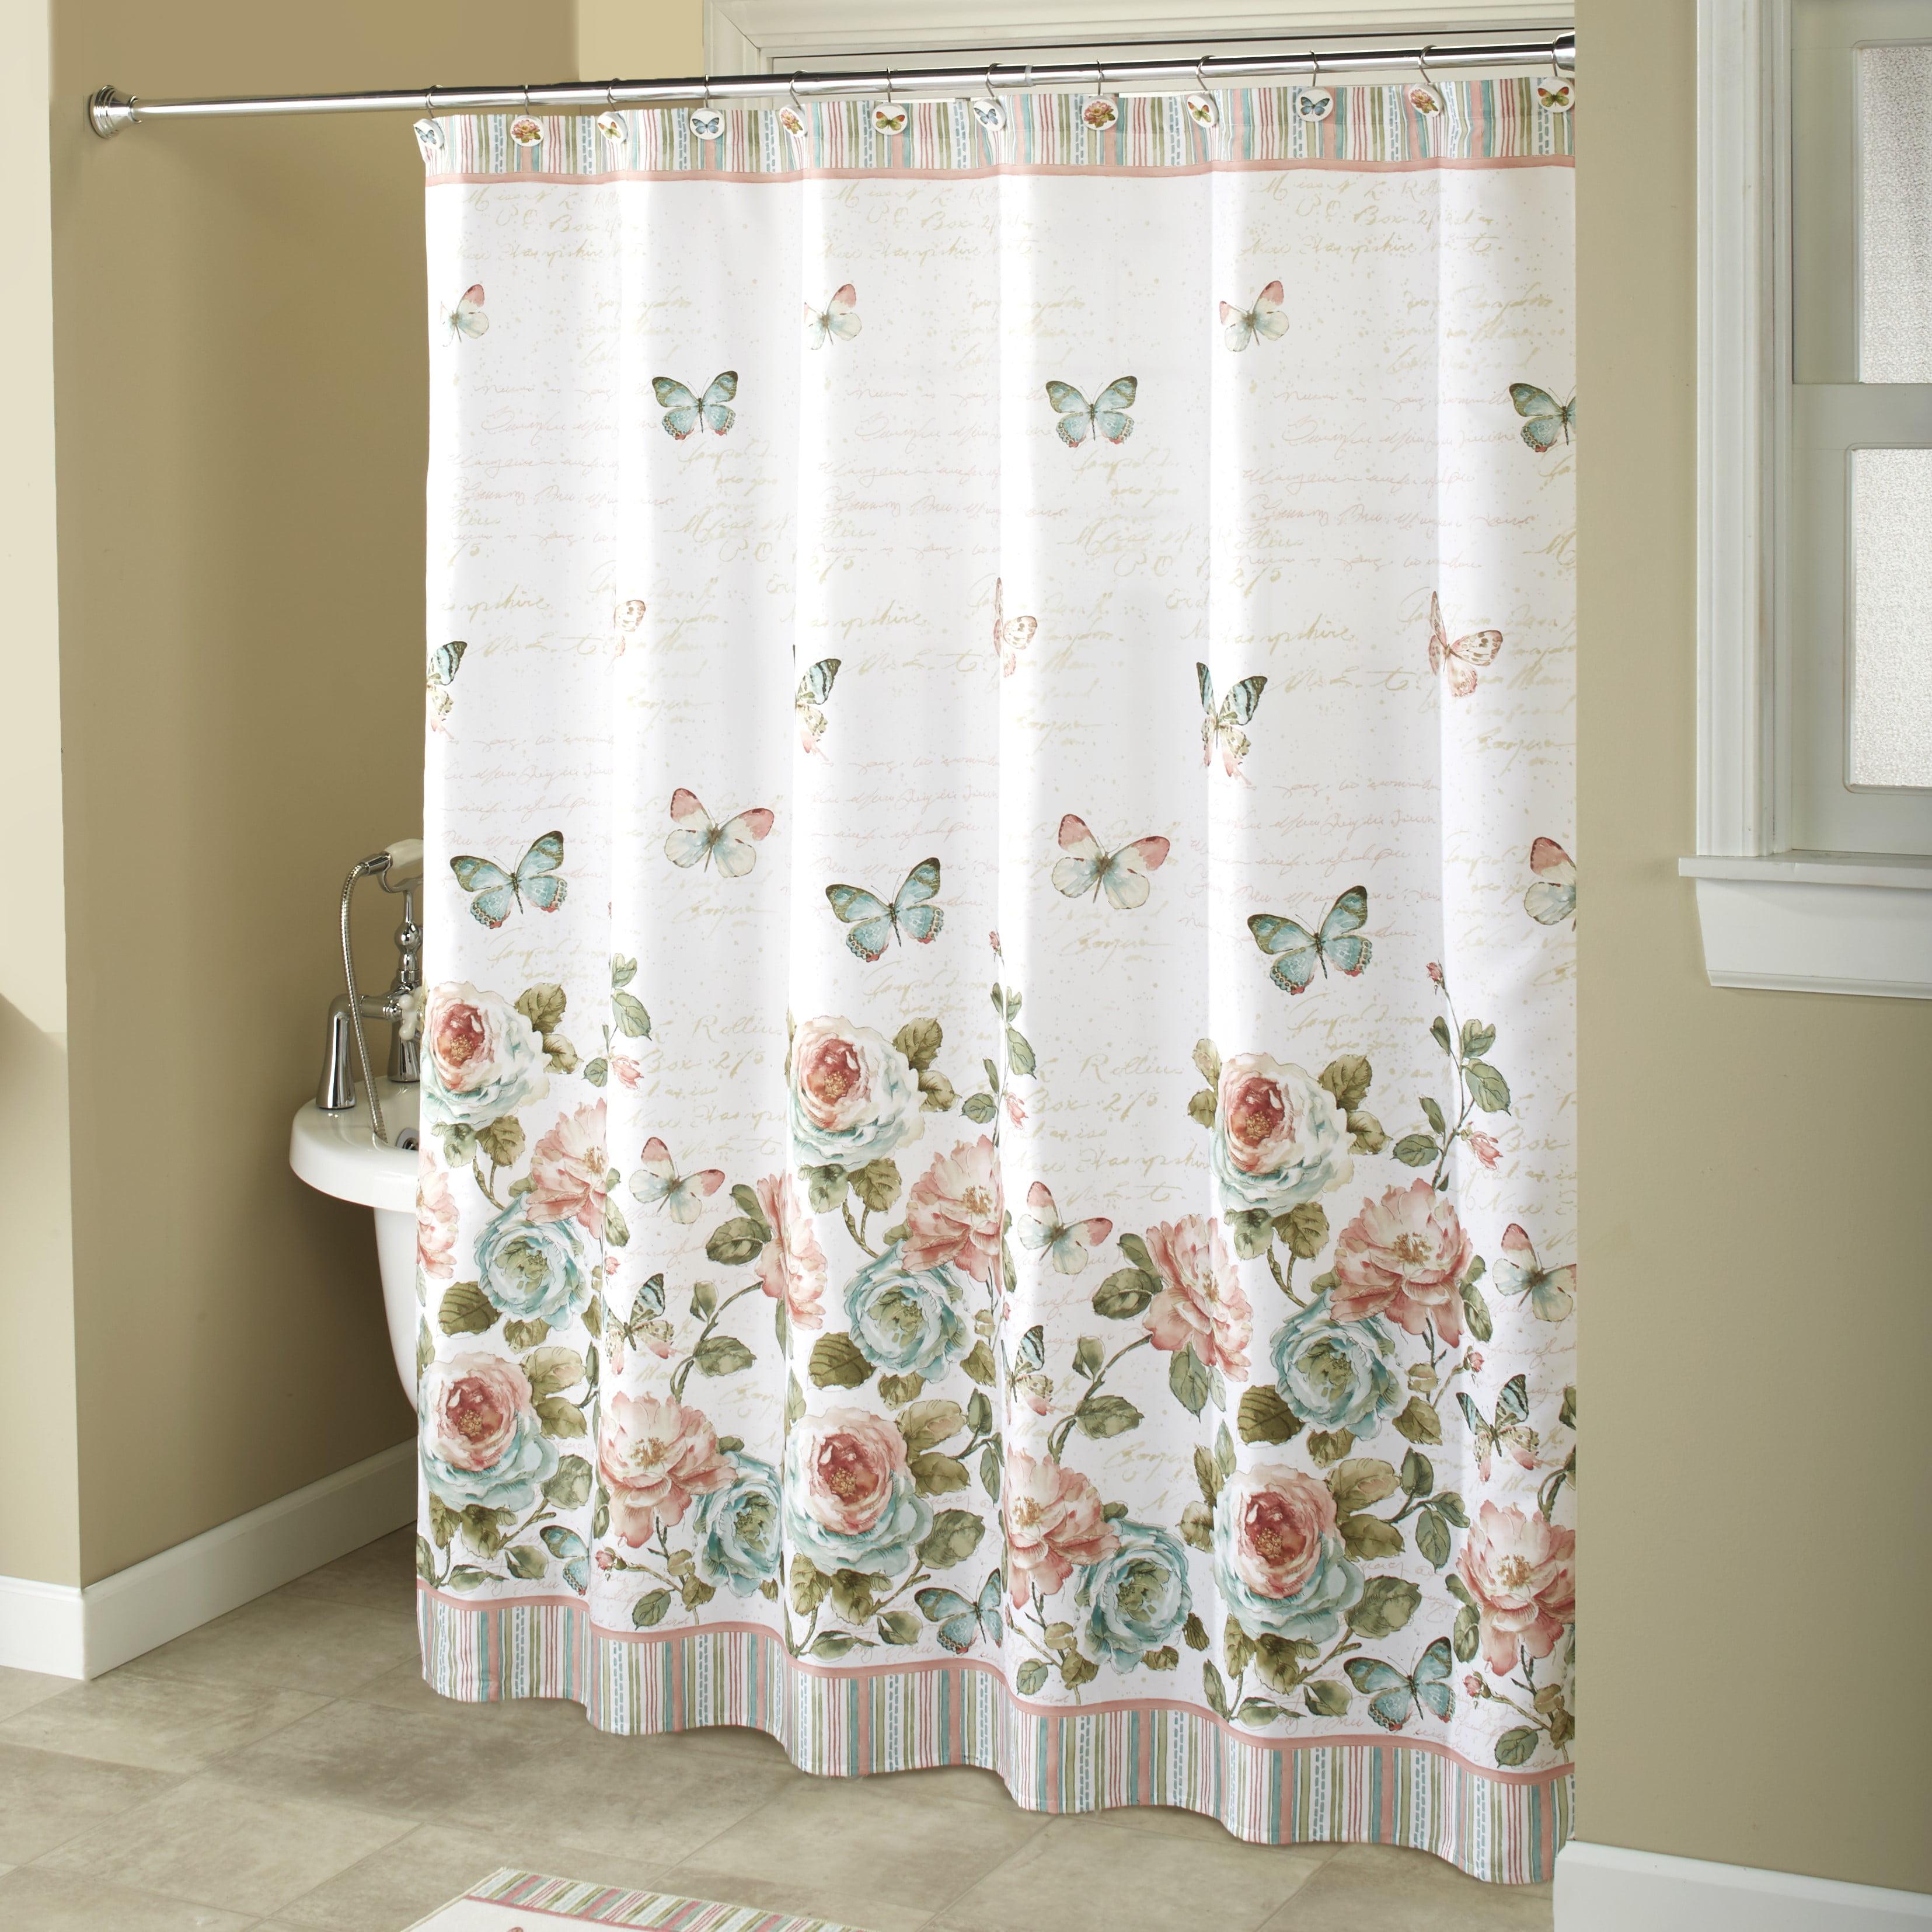 Rose Garden White Shower Curtain Farmhouse Floral Accent Walmart Com Walmart Com